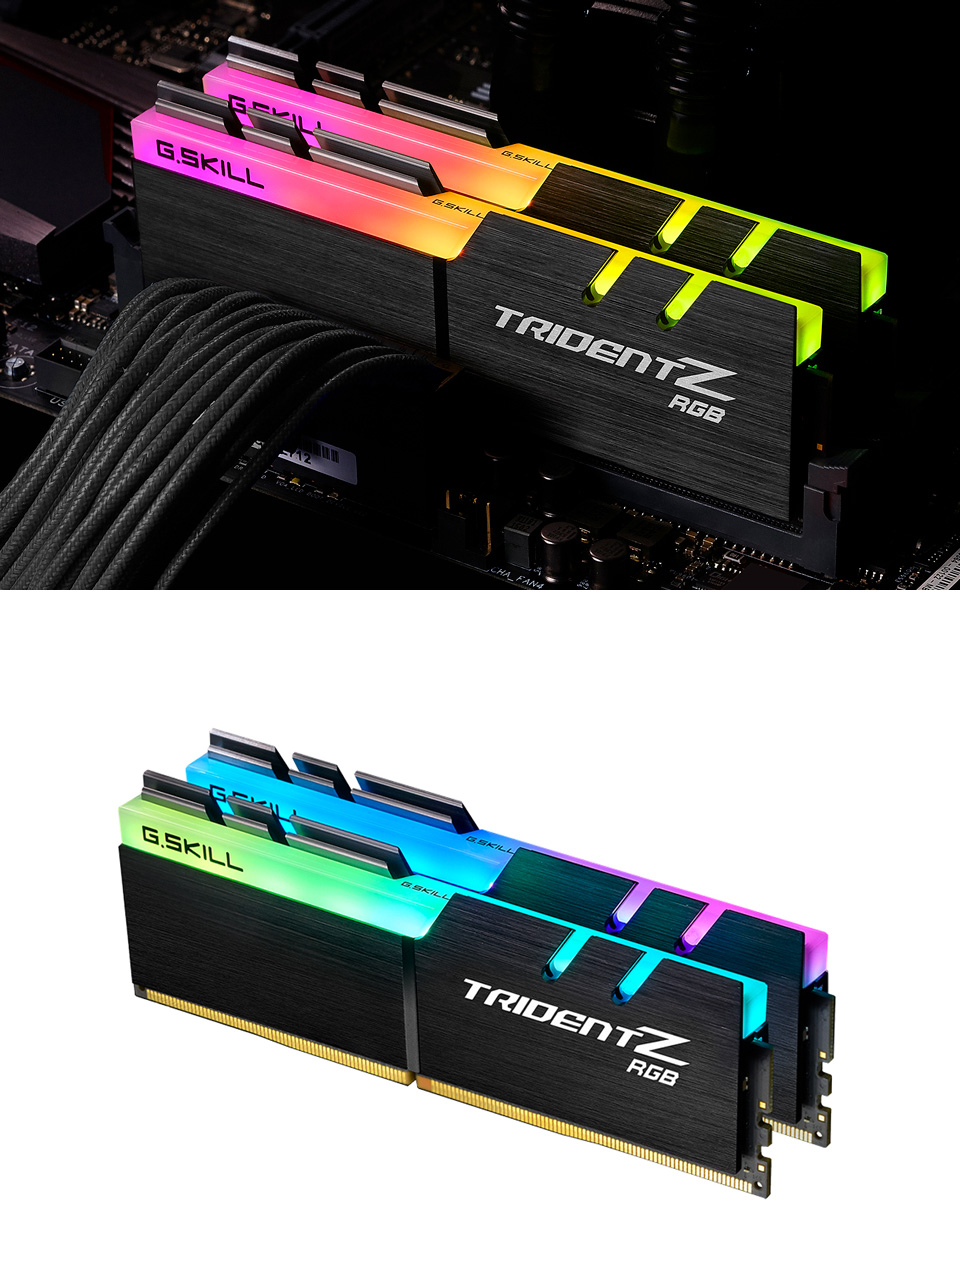 G.Skill Trident Z RGB F4-3600C16D-32GTZRC 32GB (2x16GB) DDR4 prodict